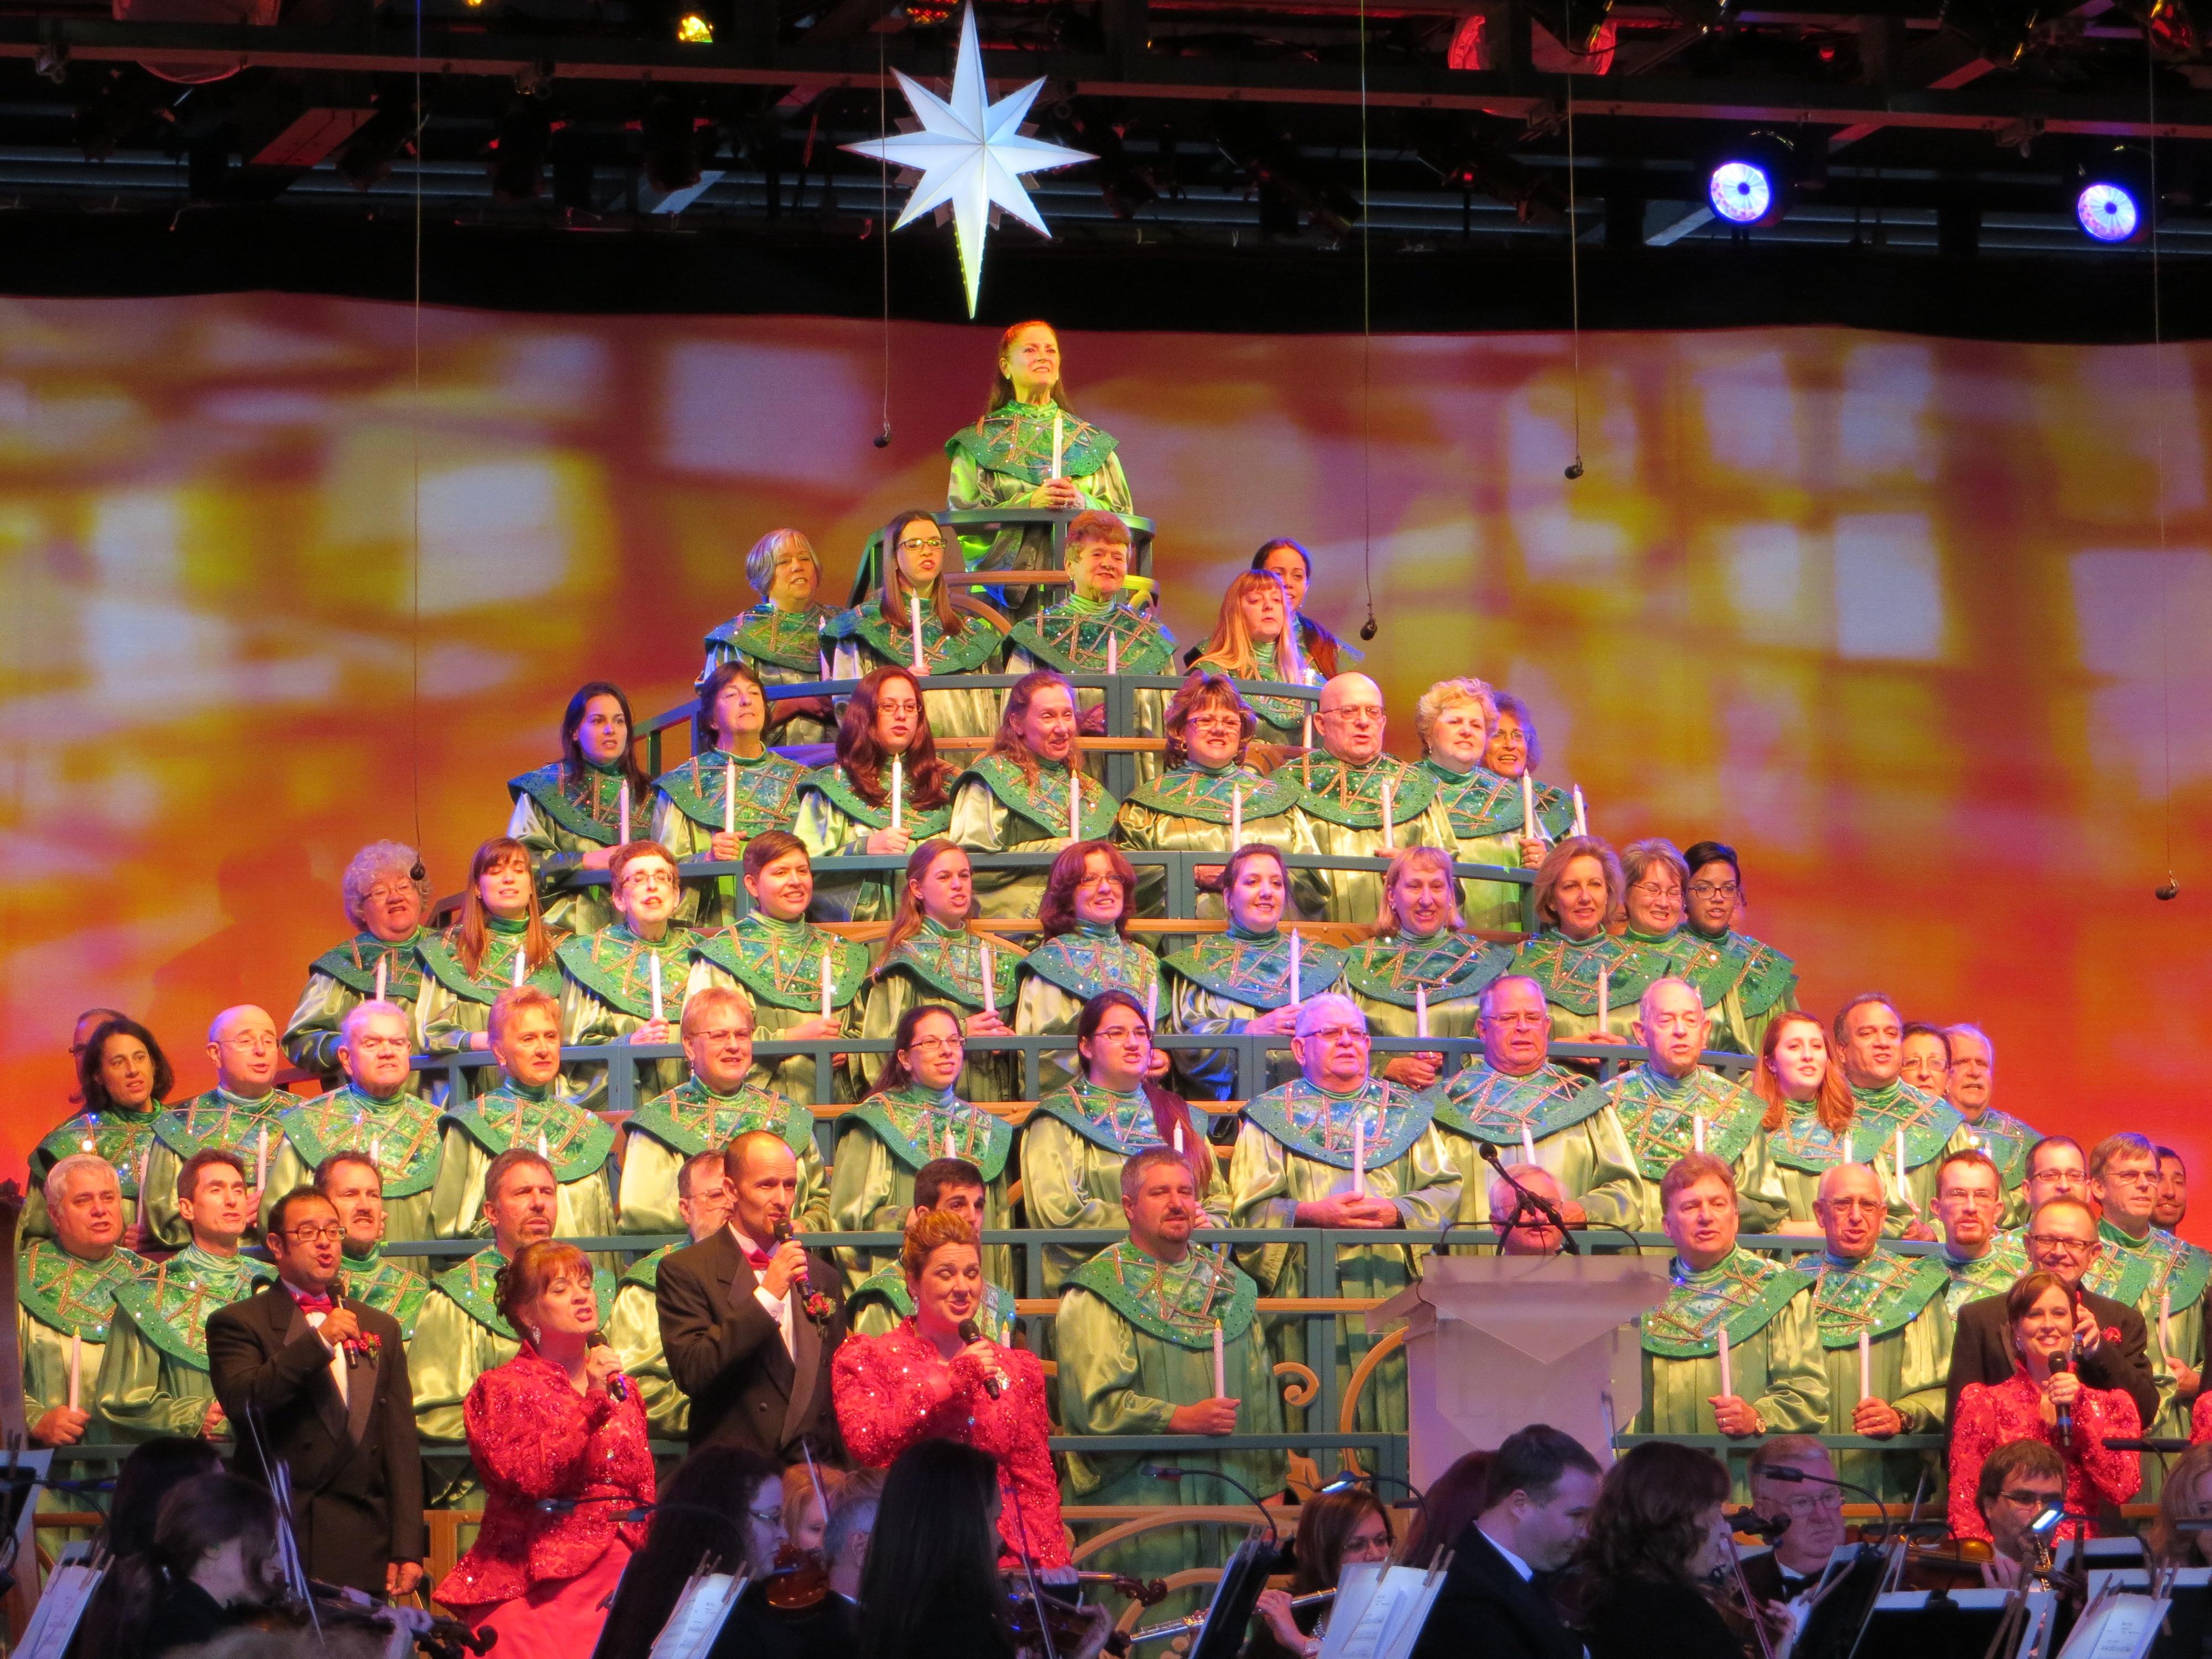 disney cast member choir makes up the christmas tree - The Christmas Choir Cast